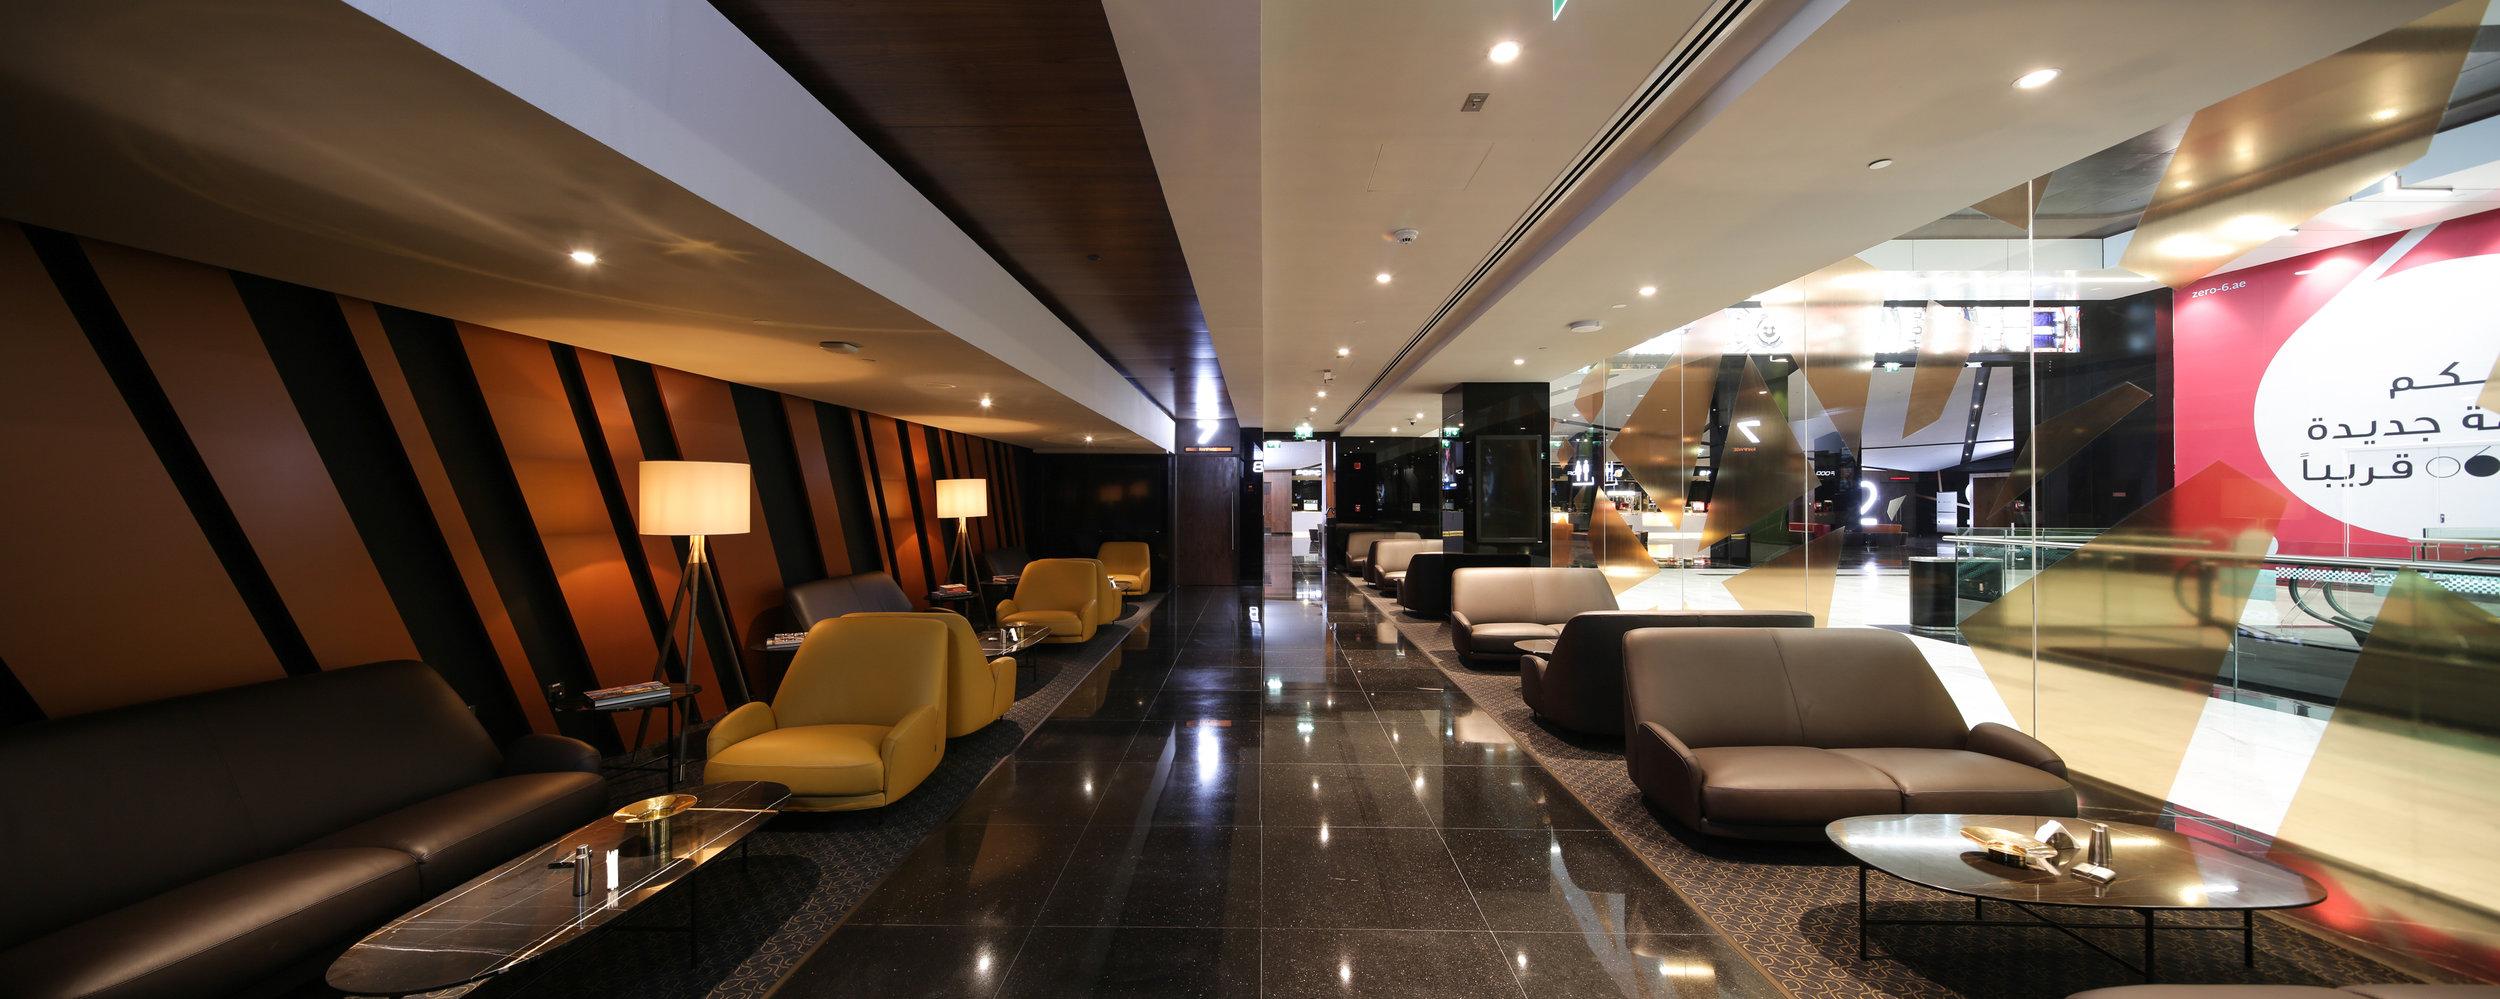 Star Lounge, Cinemacity IMAX